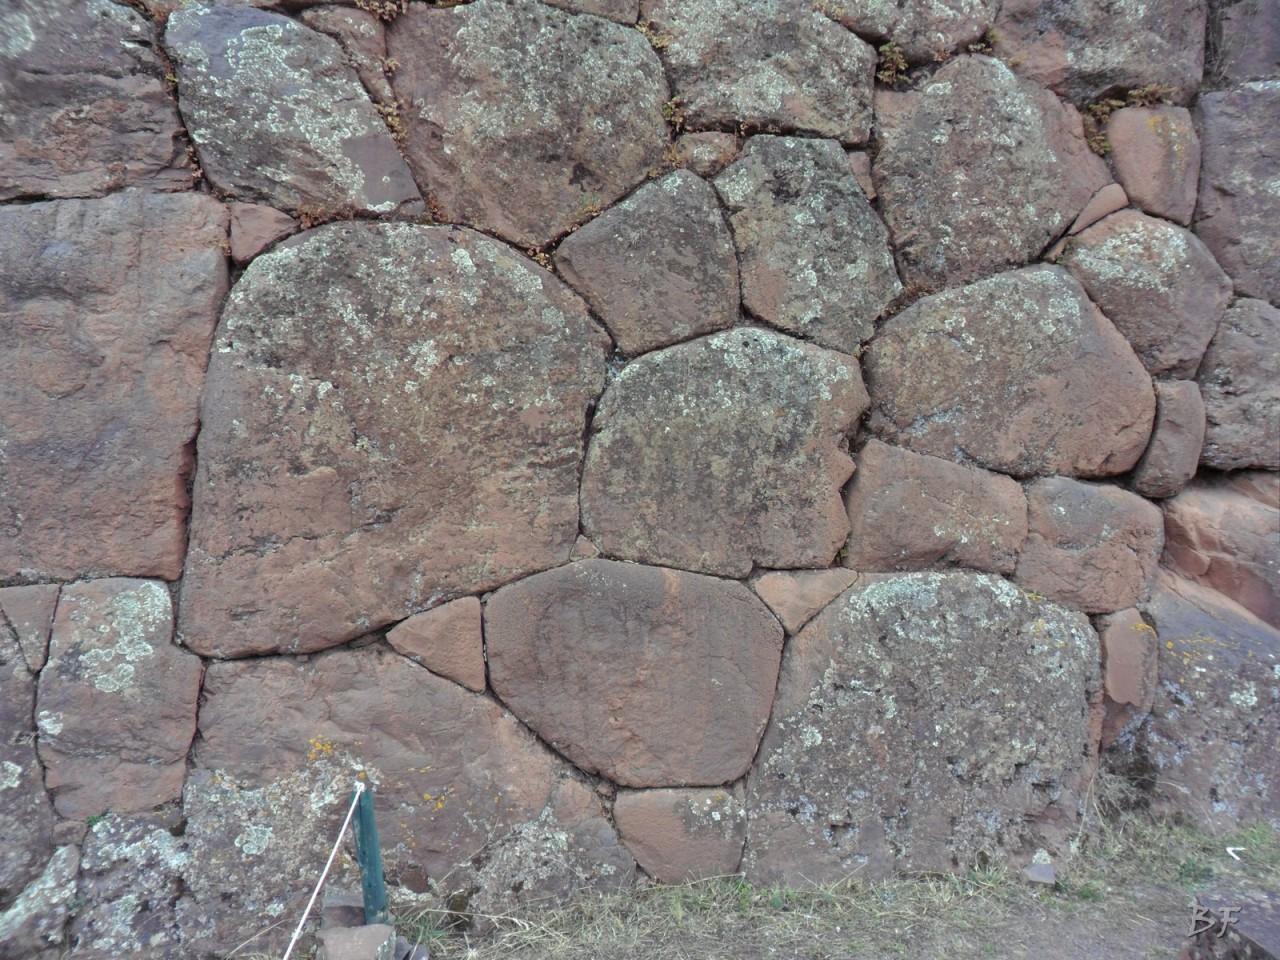 Mura-Poligonali-Megaliti-Altari-Rupestri-Pisac-Cusco-Perù-44